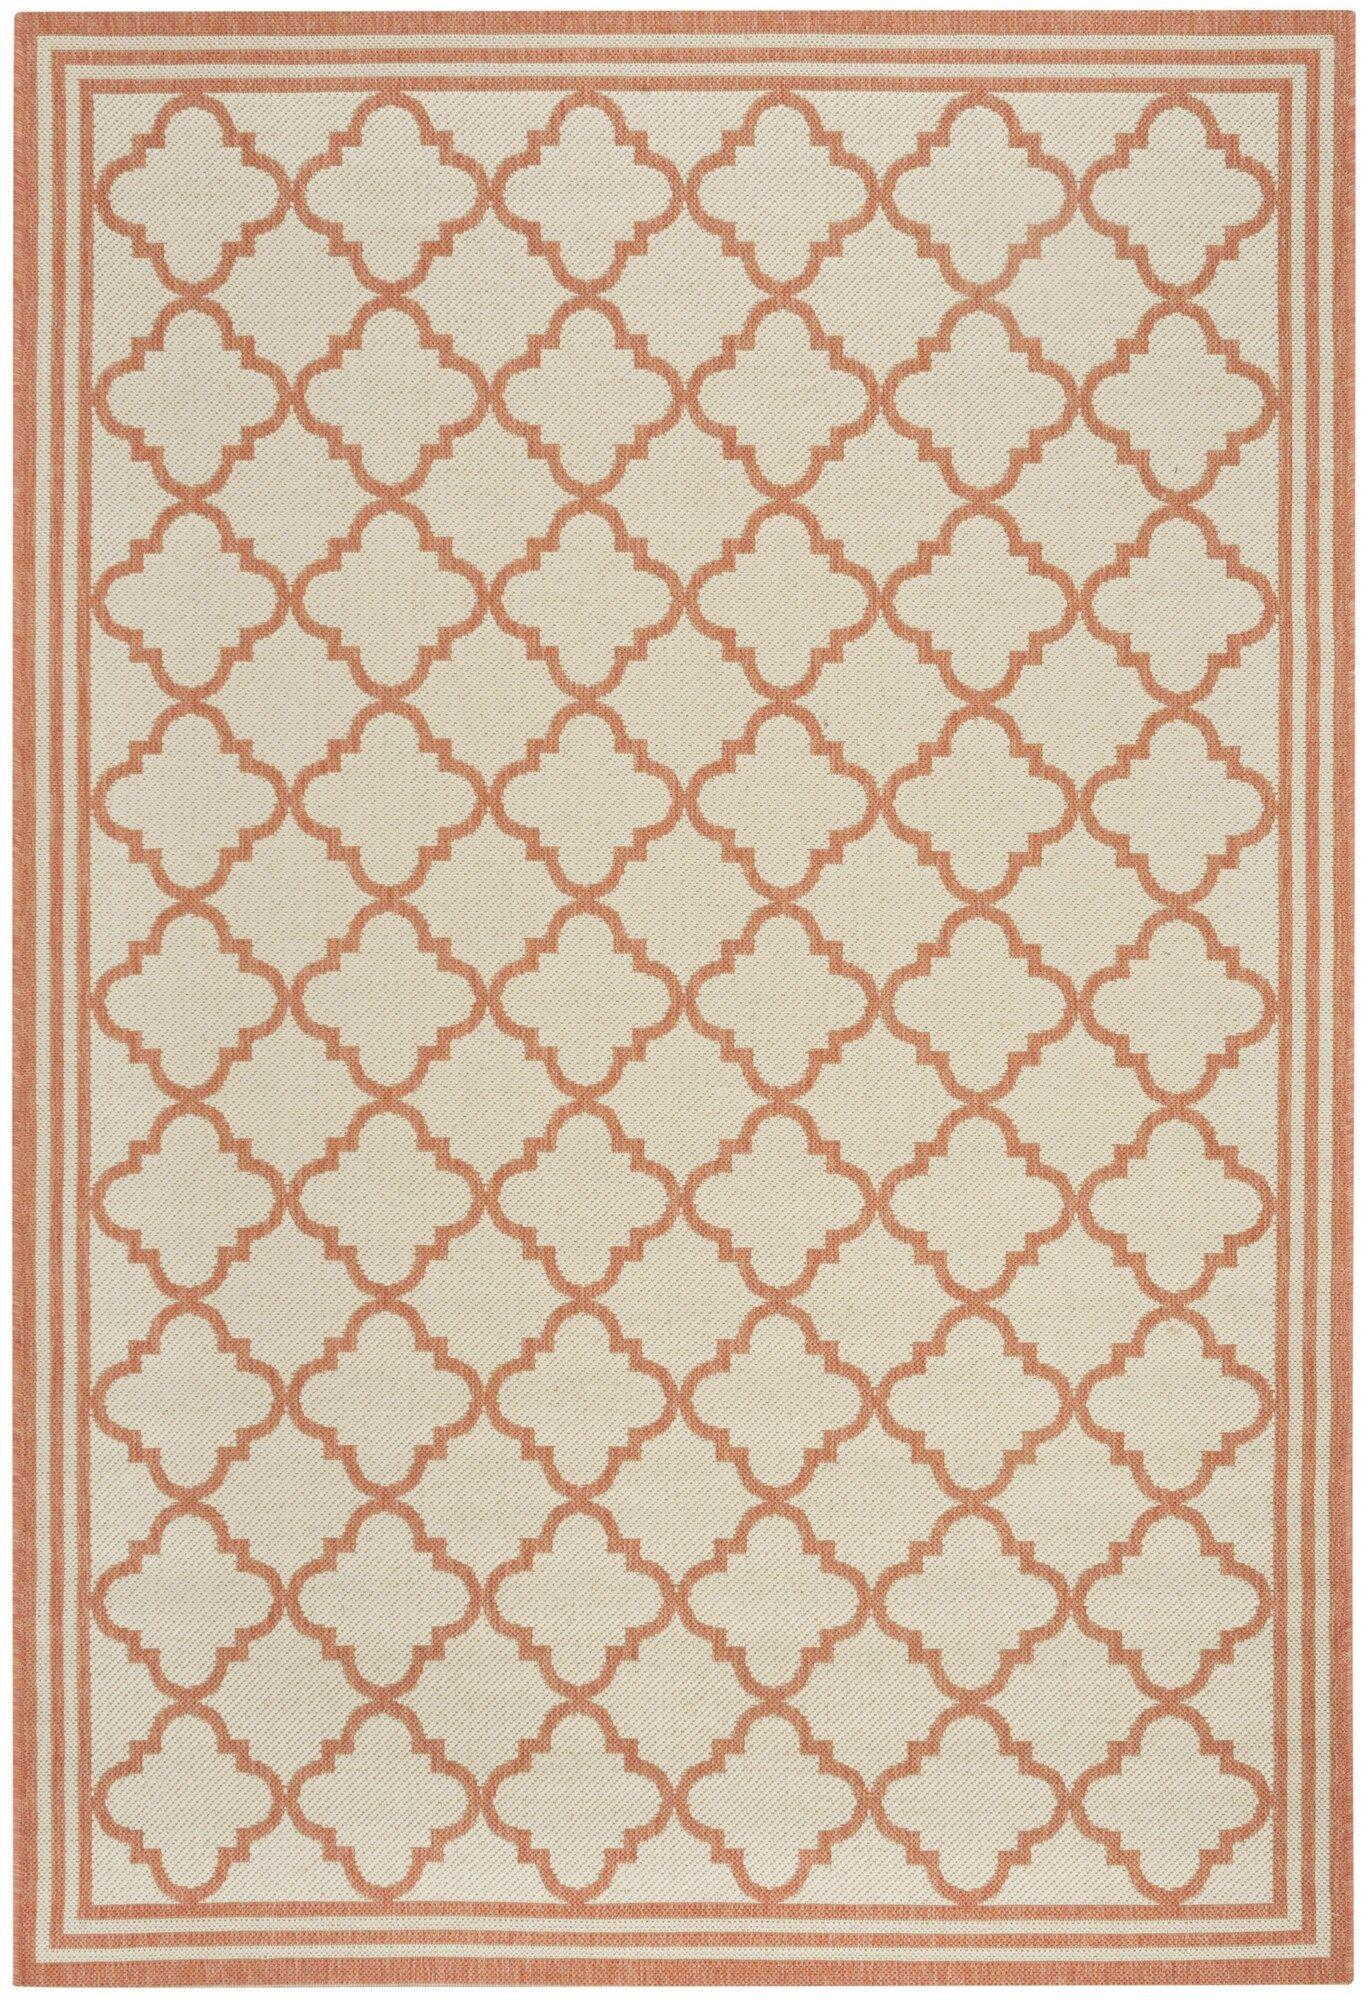 Berardi Cream/Rust Area Rug Rug Size: Rectangle 5'1